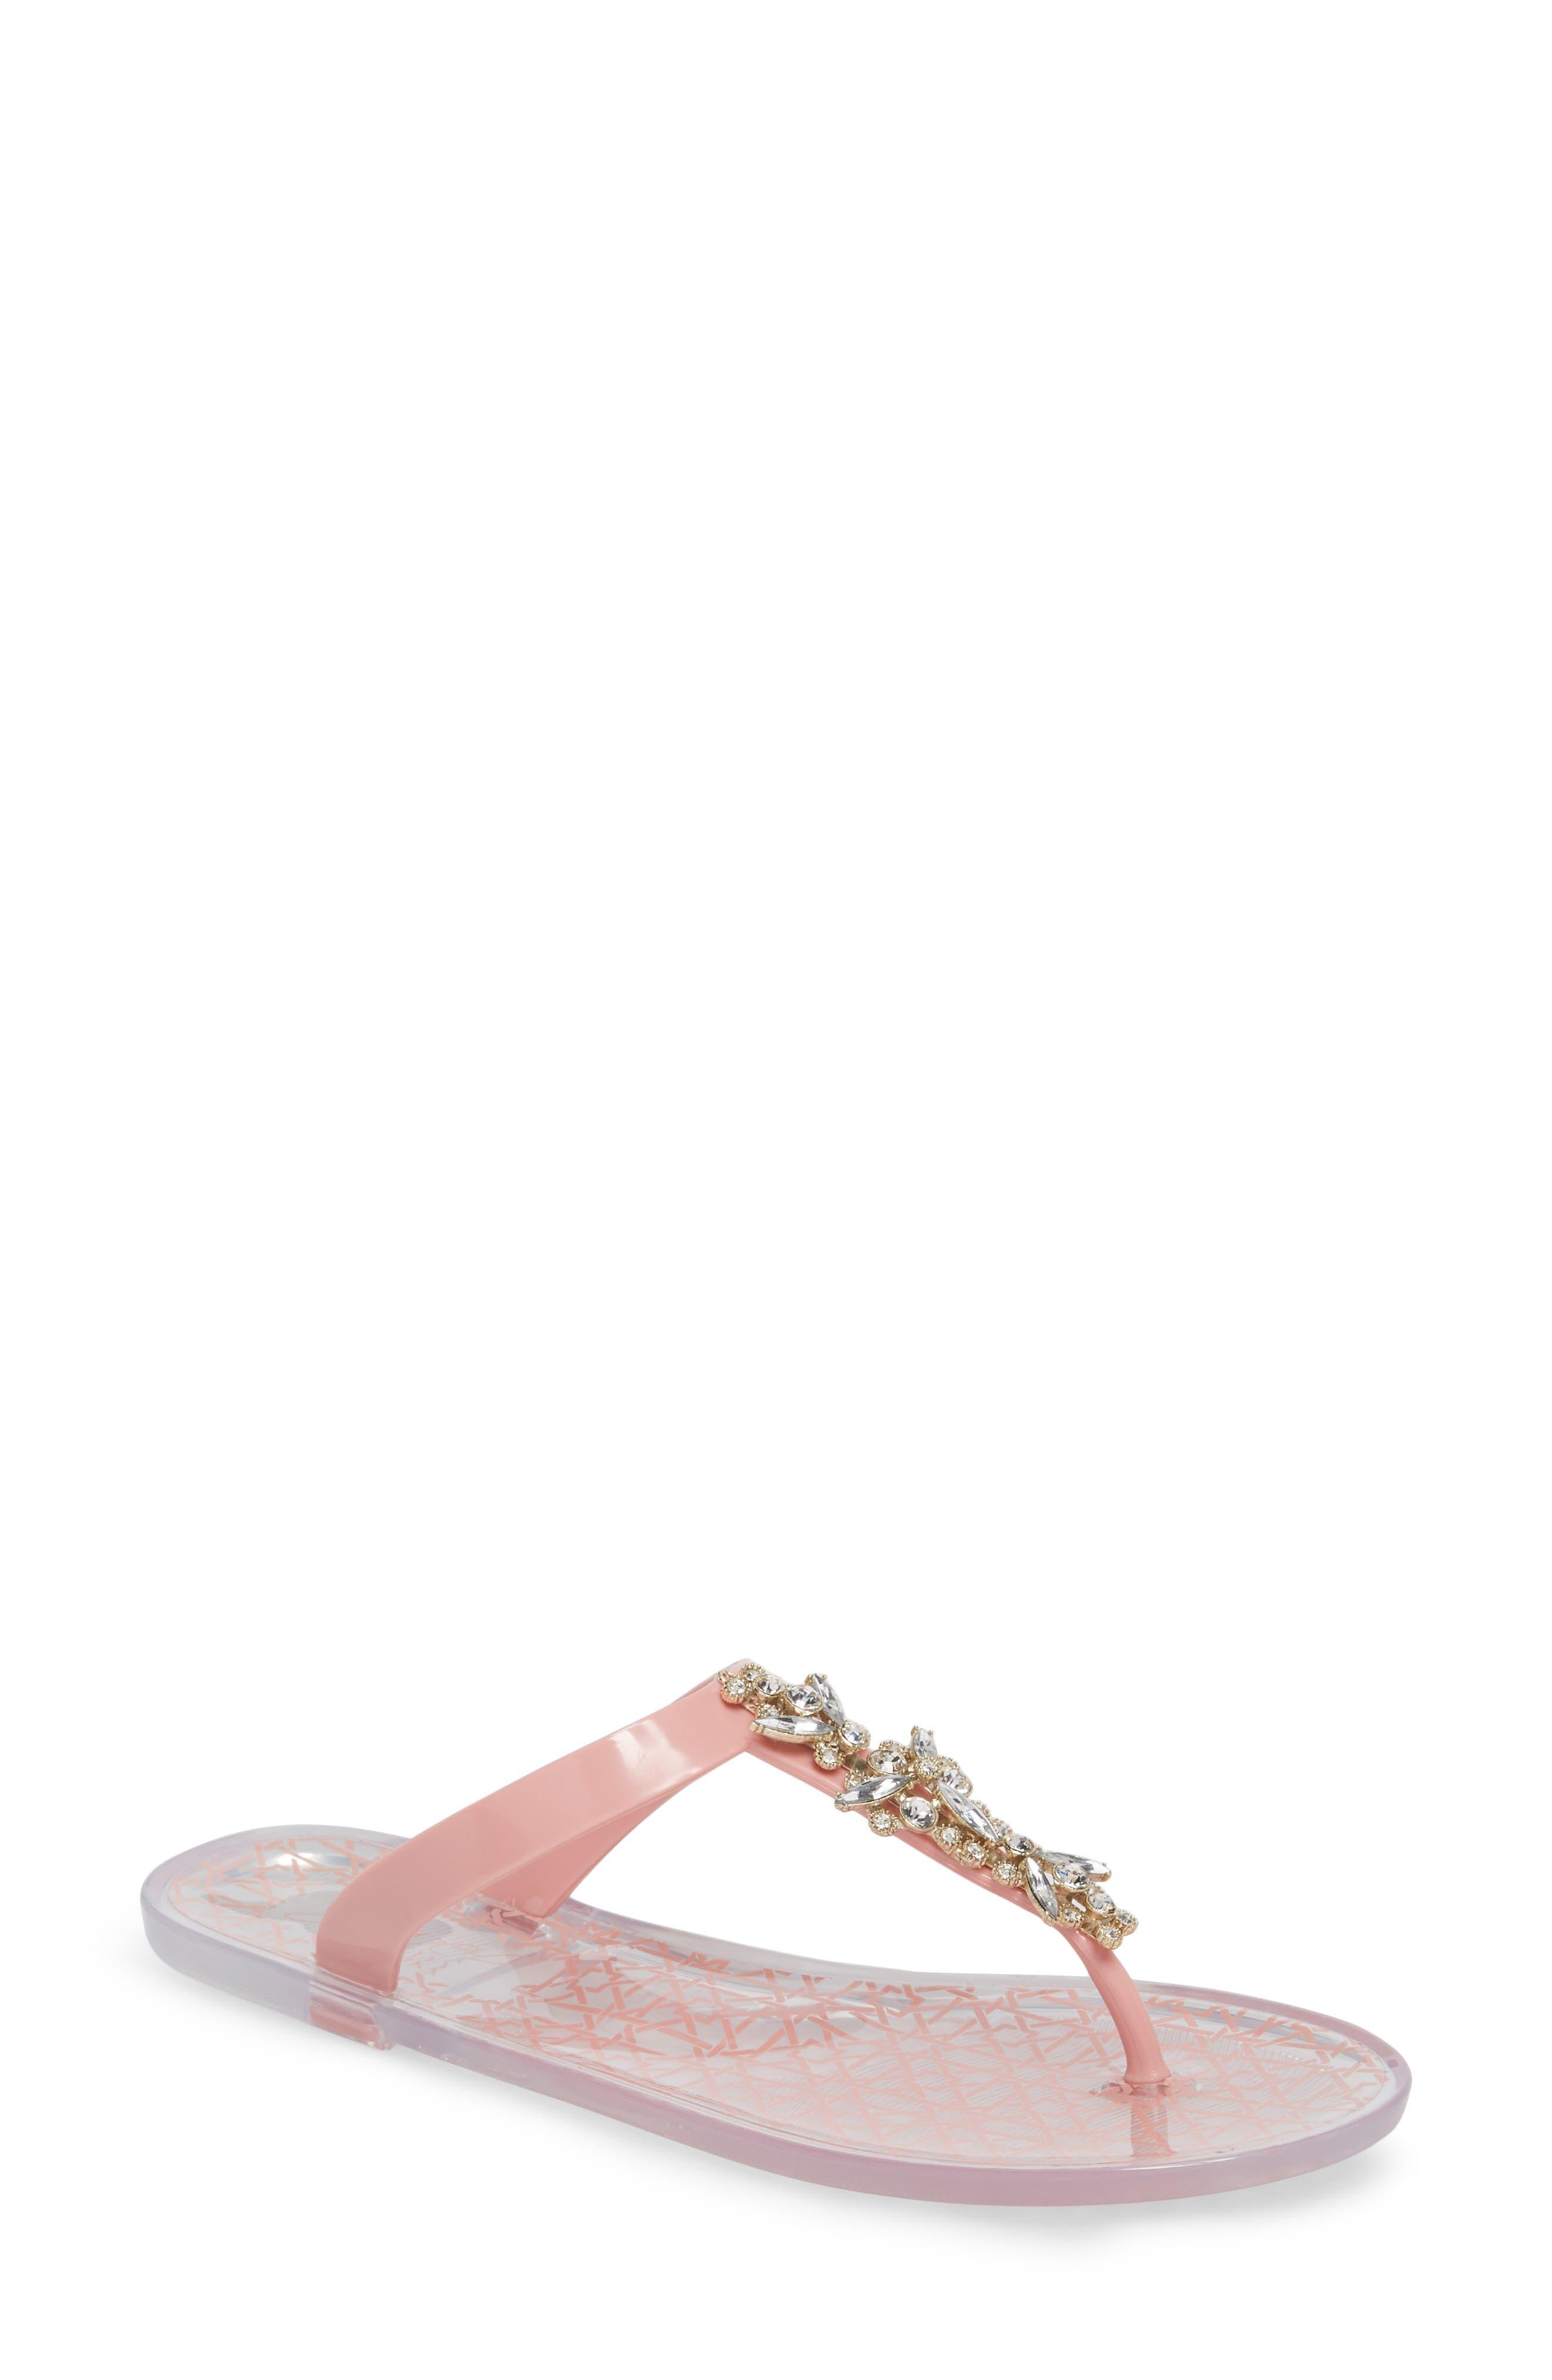 Gracia Embellished Sandal,                             Main thumbnail 3, color,